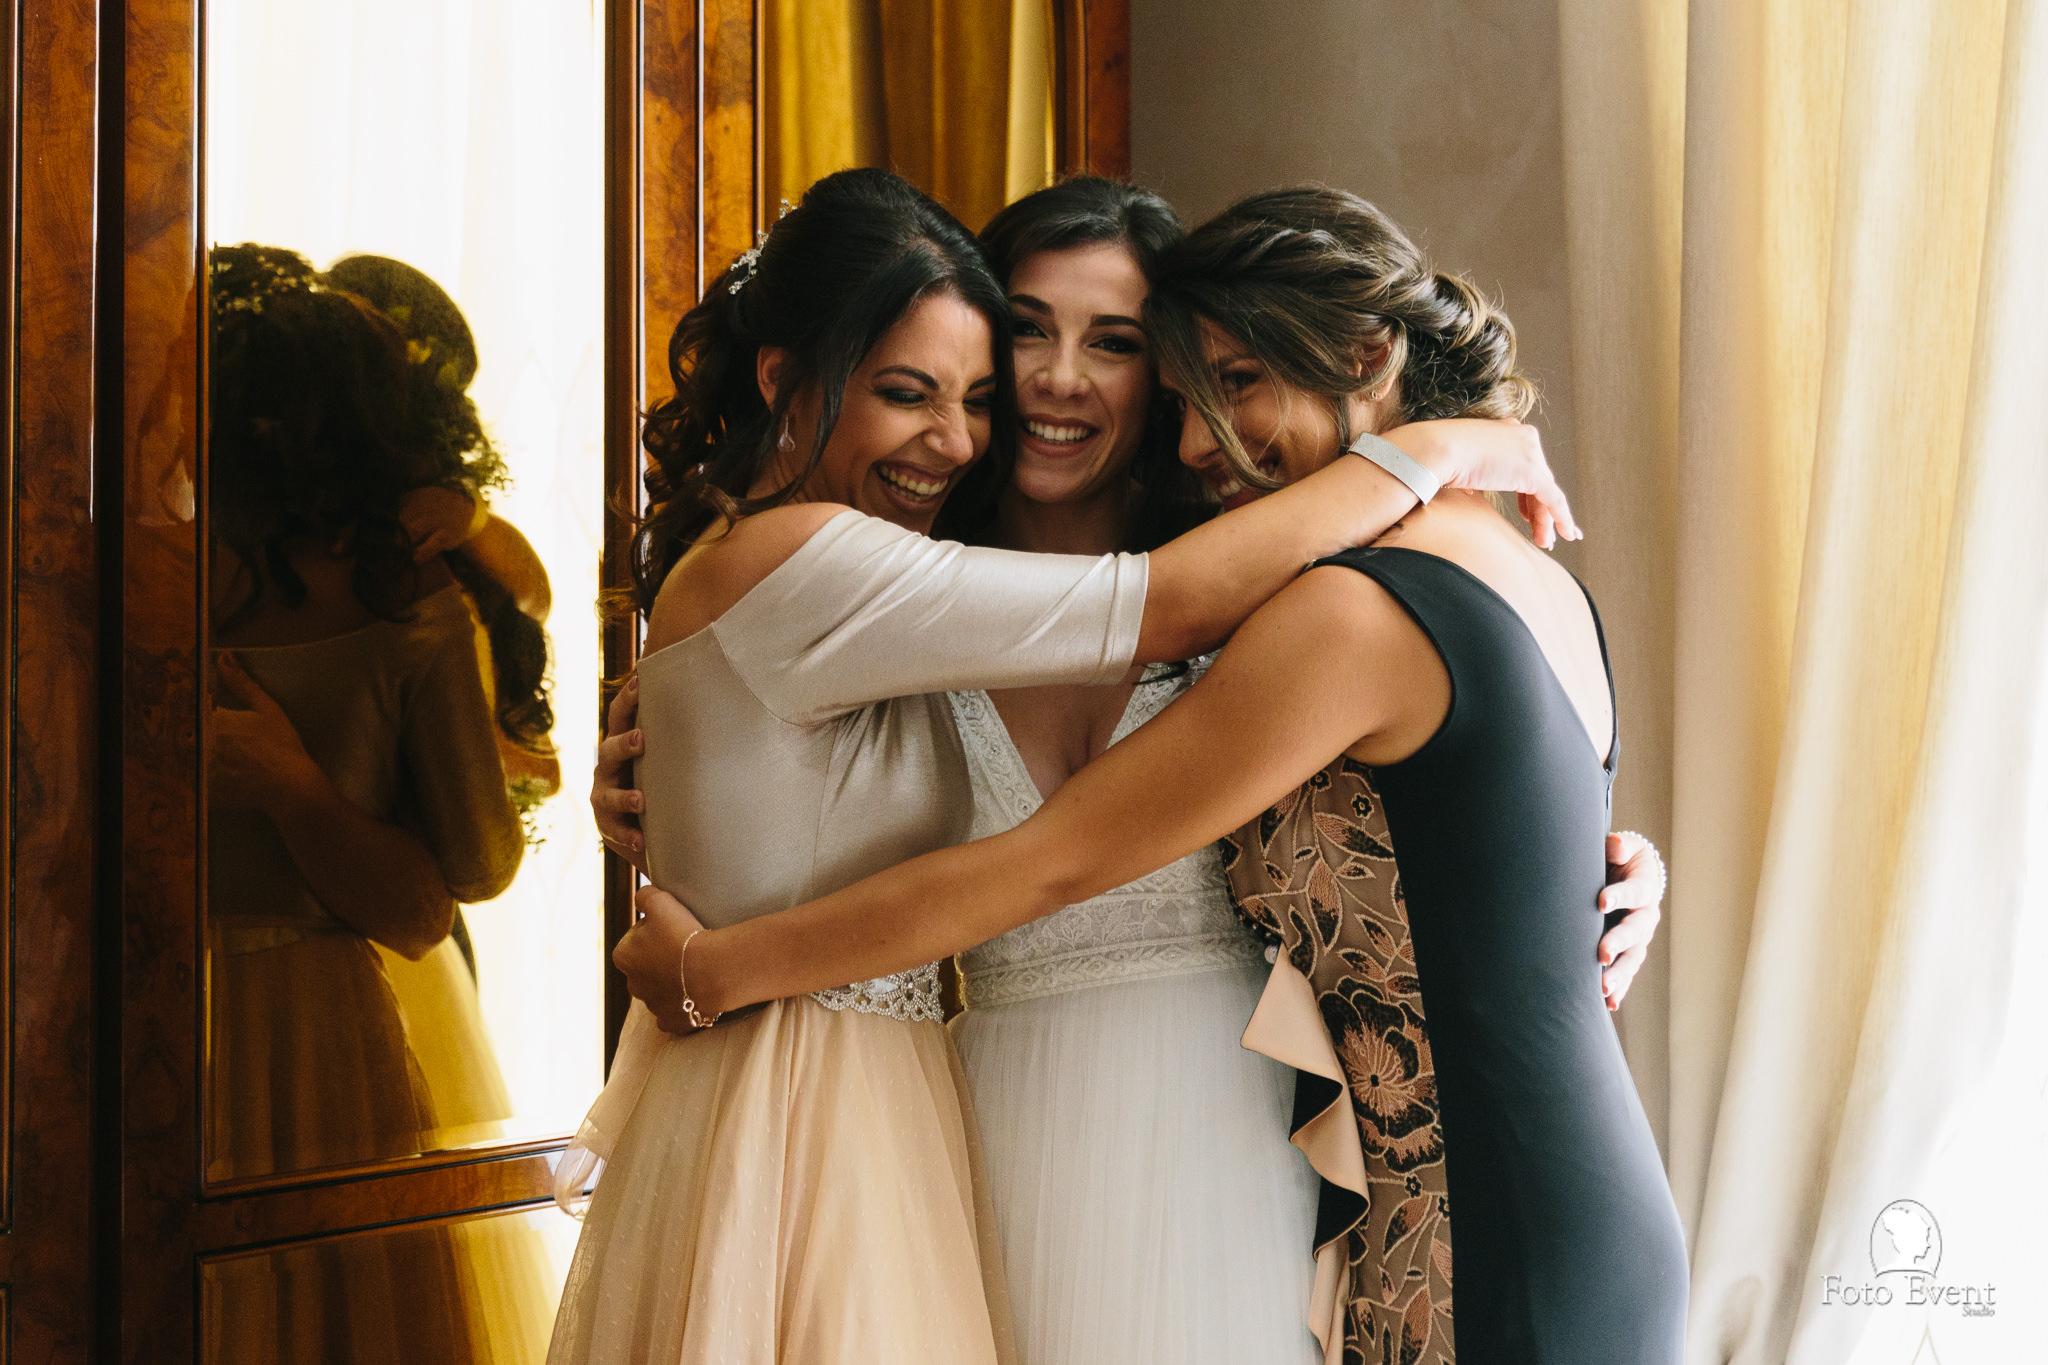 002-2019-08-23-Matrimonio-Lucia-e-Rosario-Scopelliti-5DE-912